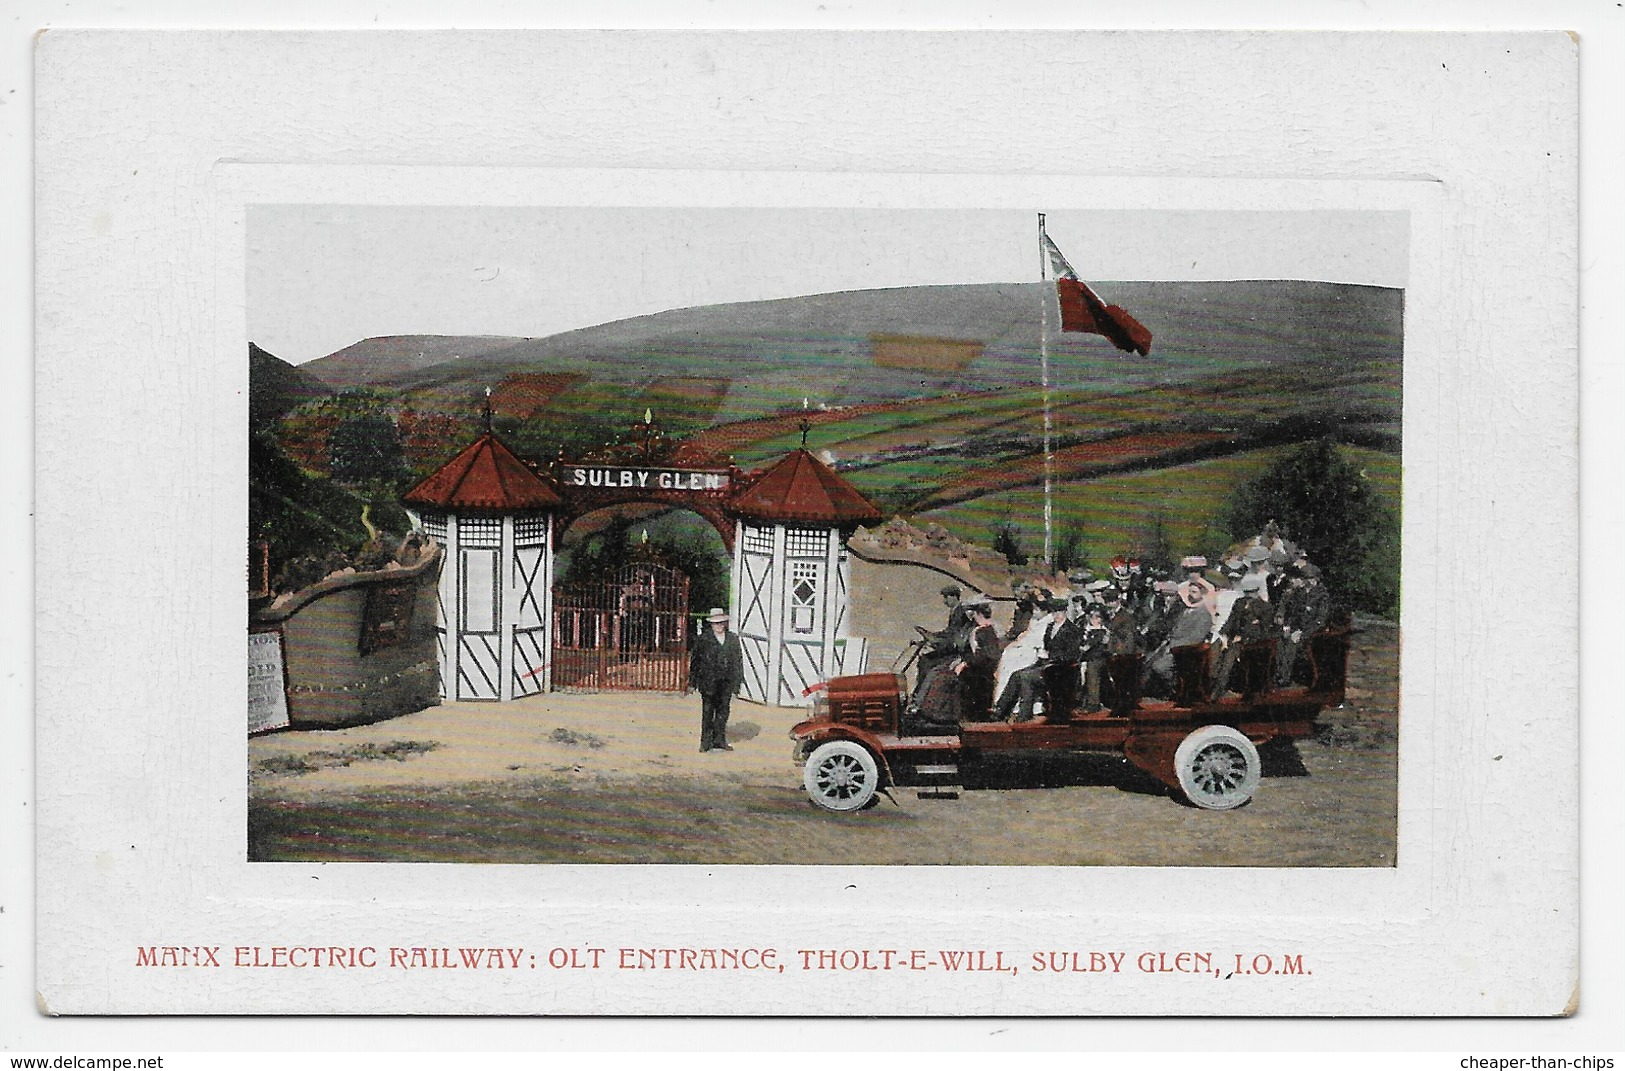 Manx Electric Railway : Olt Entrance, Tholt-E-Will, Sulby Glen, I.O.M. - Isle Of Man